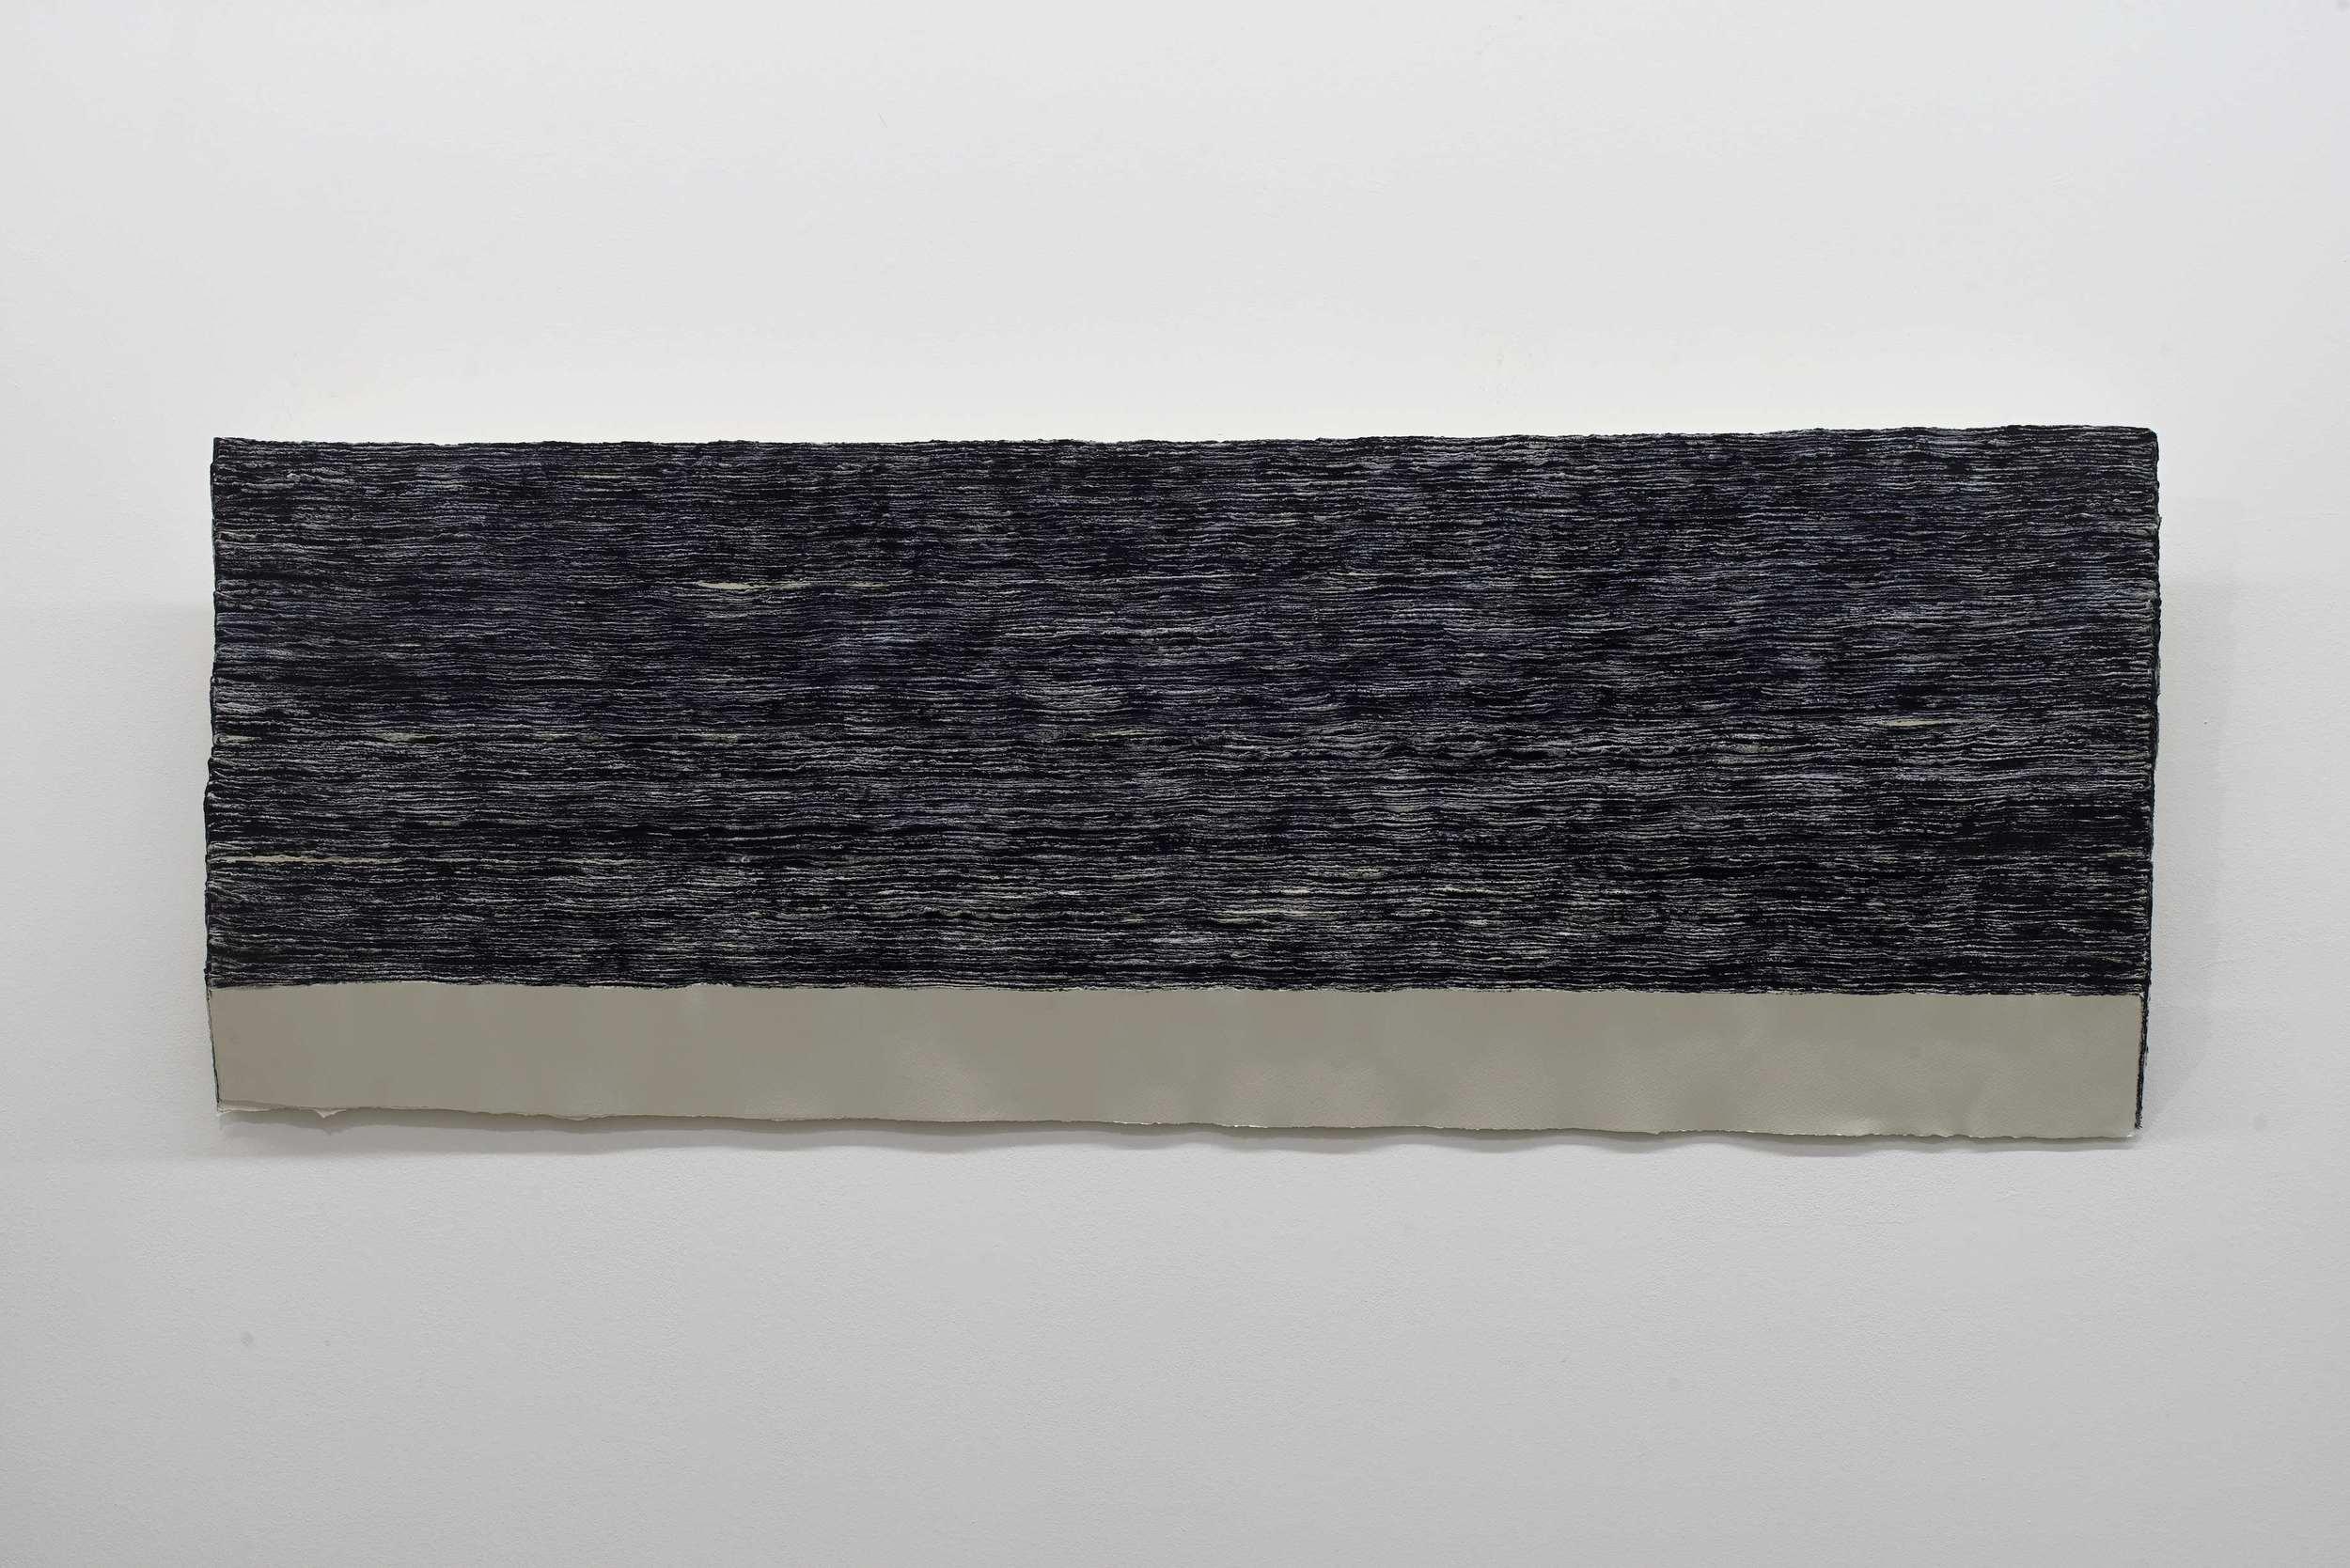 n. 329 - sedimentation (diptych) [Right] 2015 Acid-free cotton pulp watercolour paper, archival EVA glue, Aizumiiro (tourmaline mineral pigment), Ultramarine ash pigment and nikawa (cow glue hide) H58 x D150 x W6 cm (each; artwork)